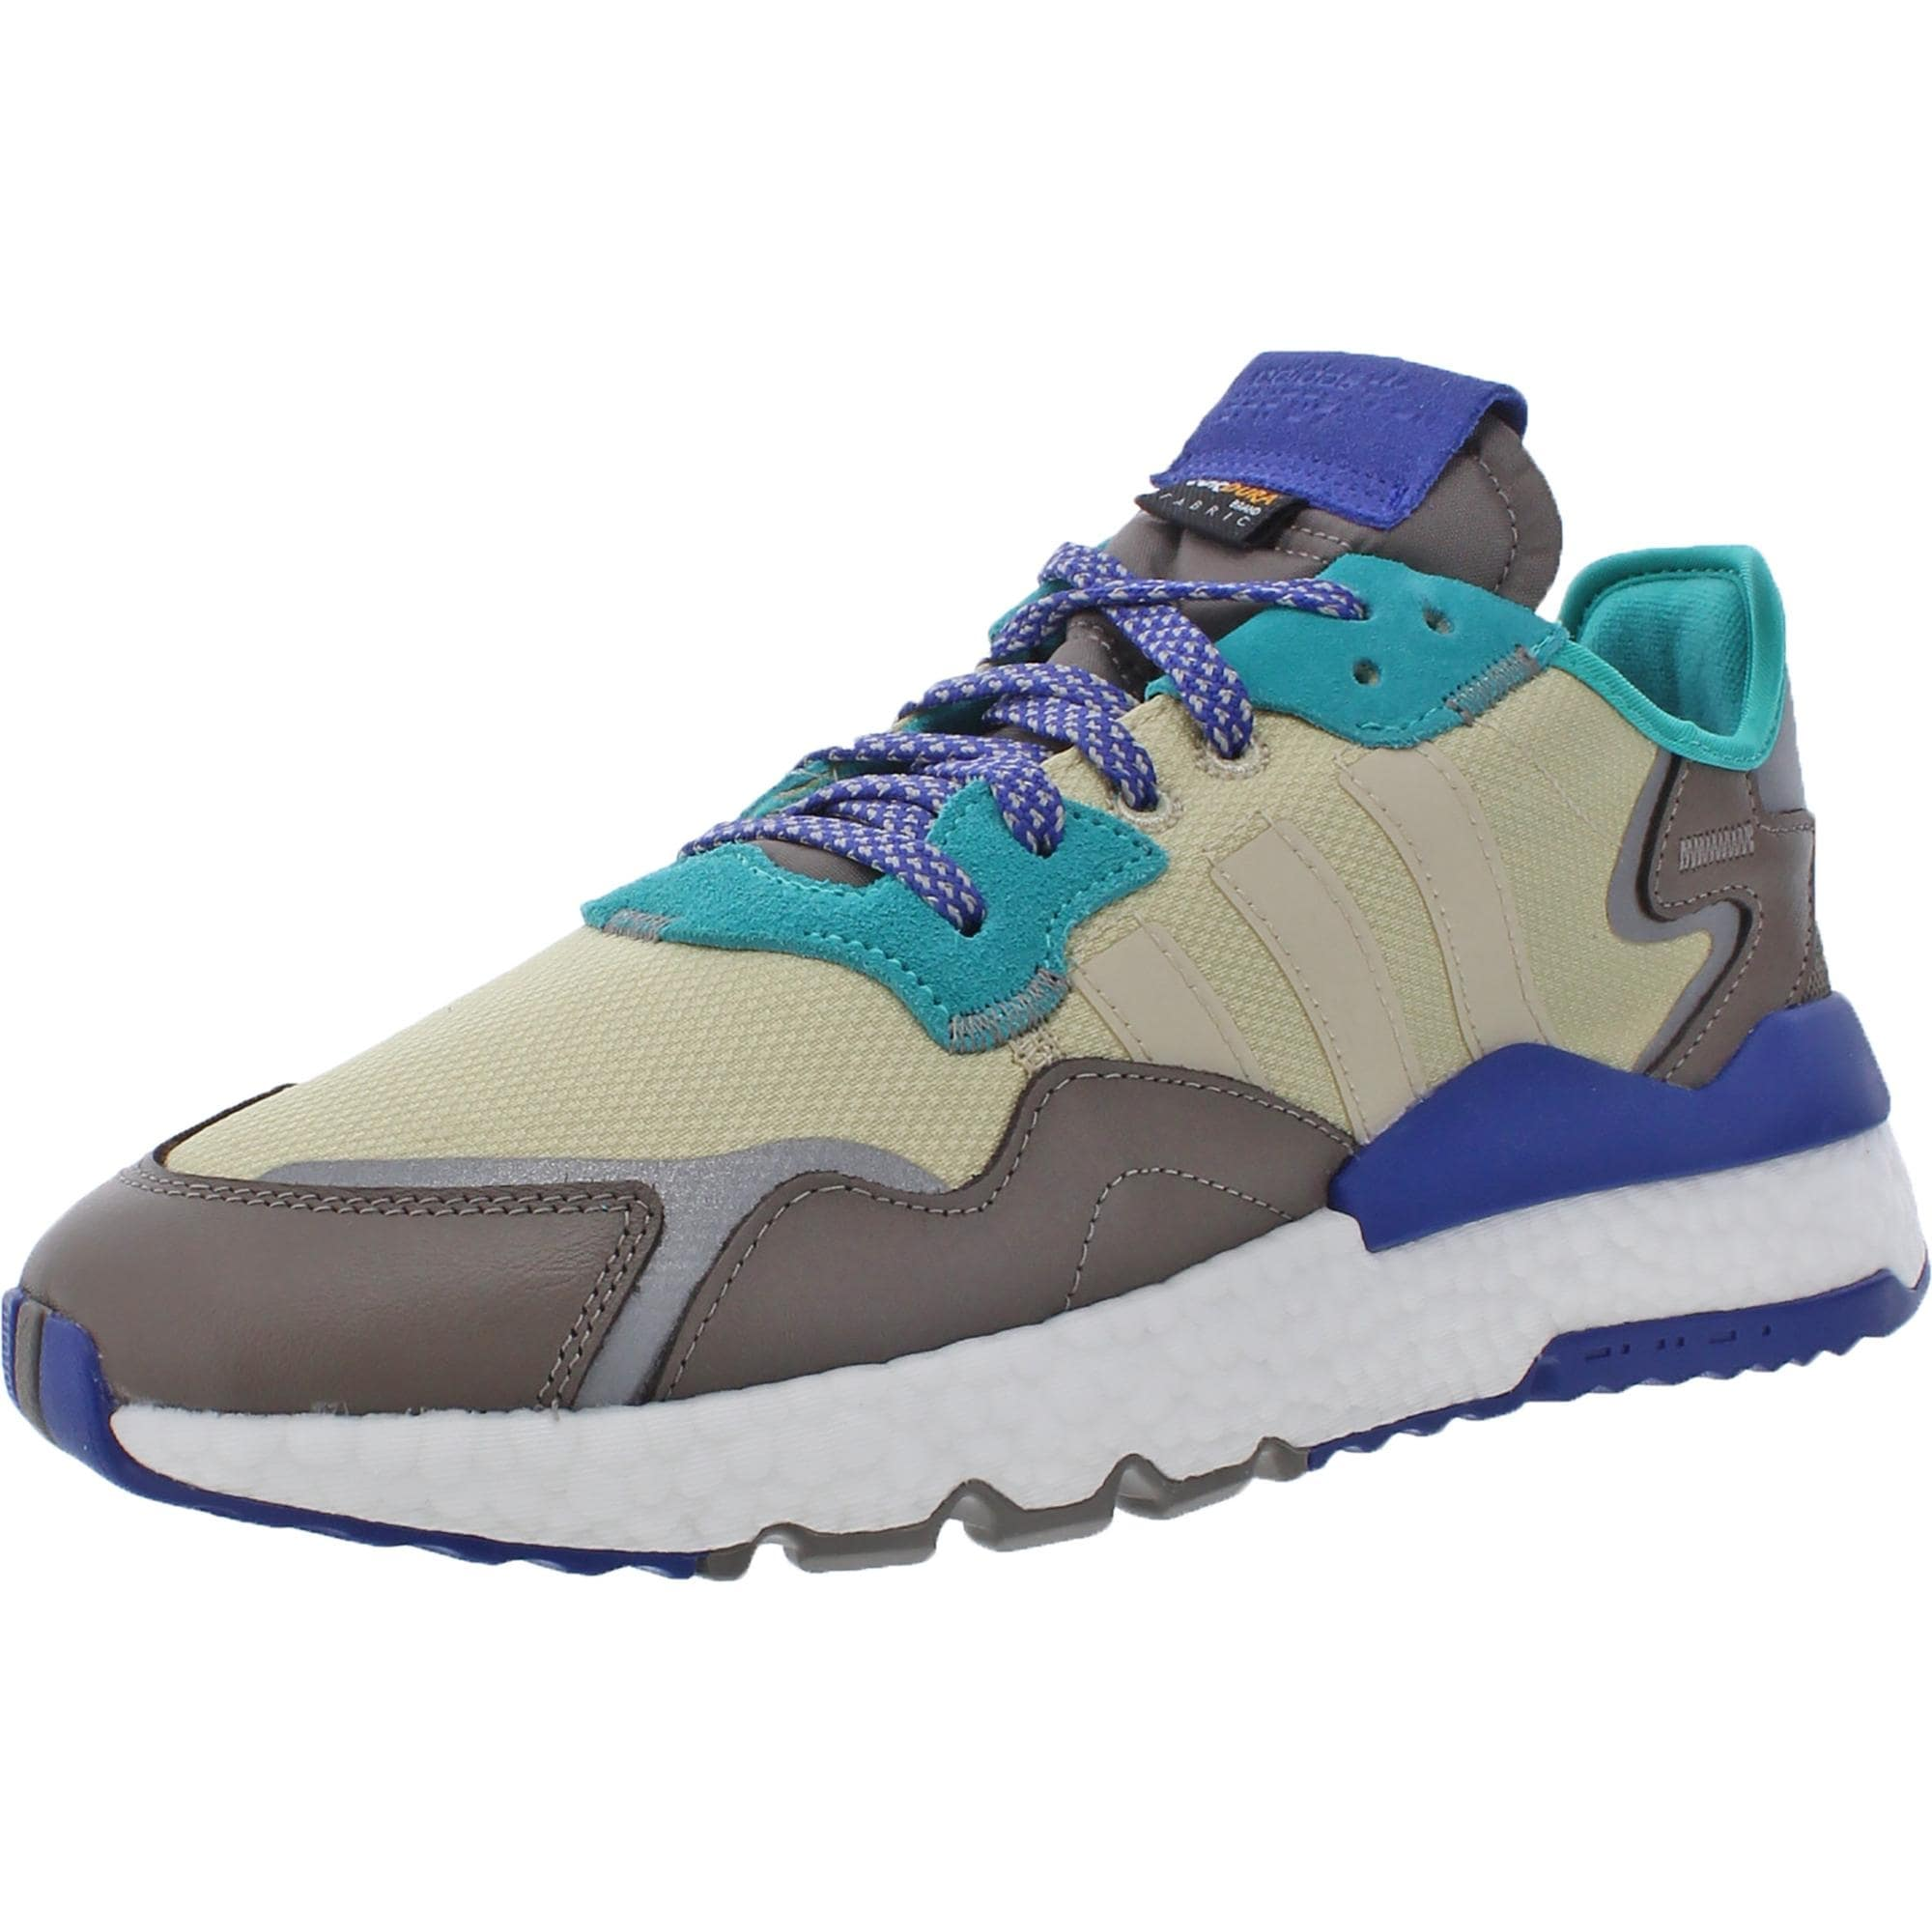 adidas Originals Mens Nite Jogger Running Shoes Knit Fitness - Desert Sand/Simple Brown